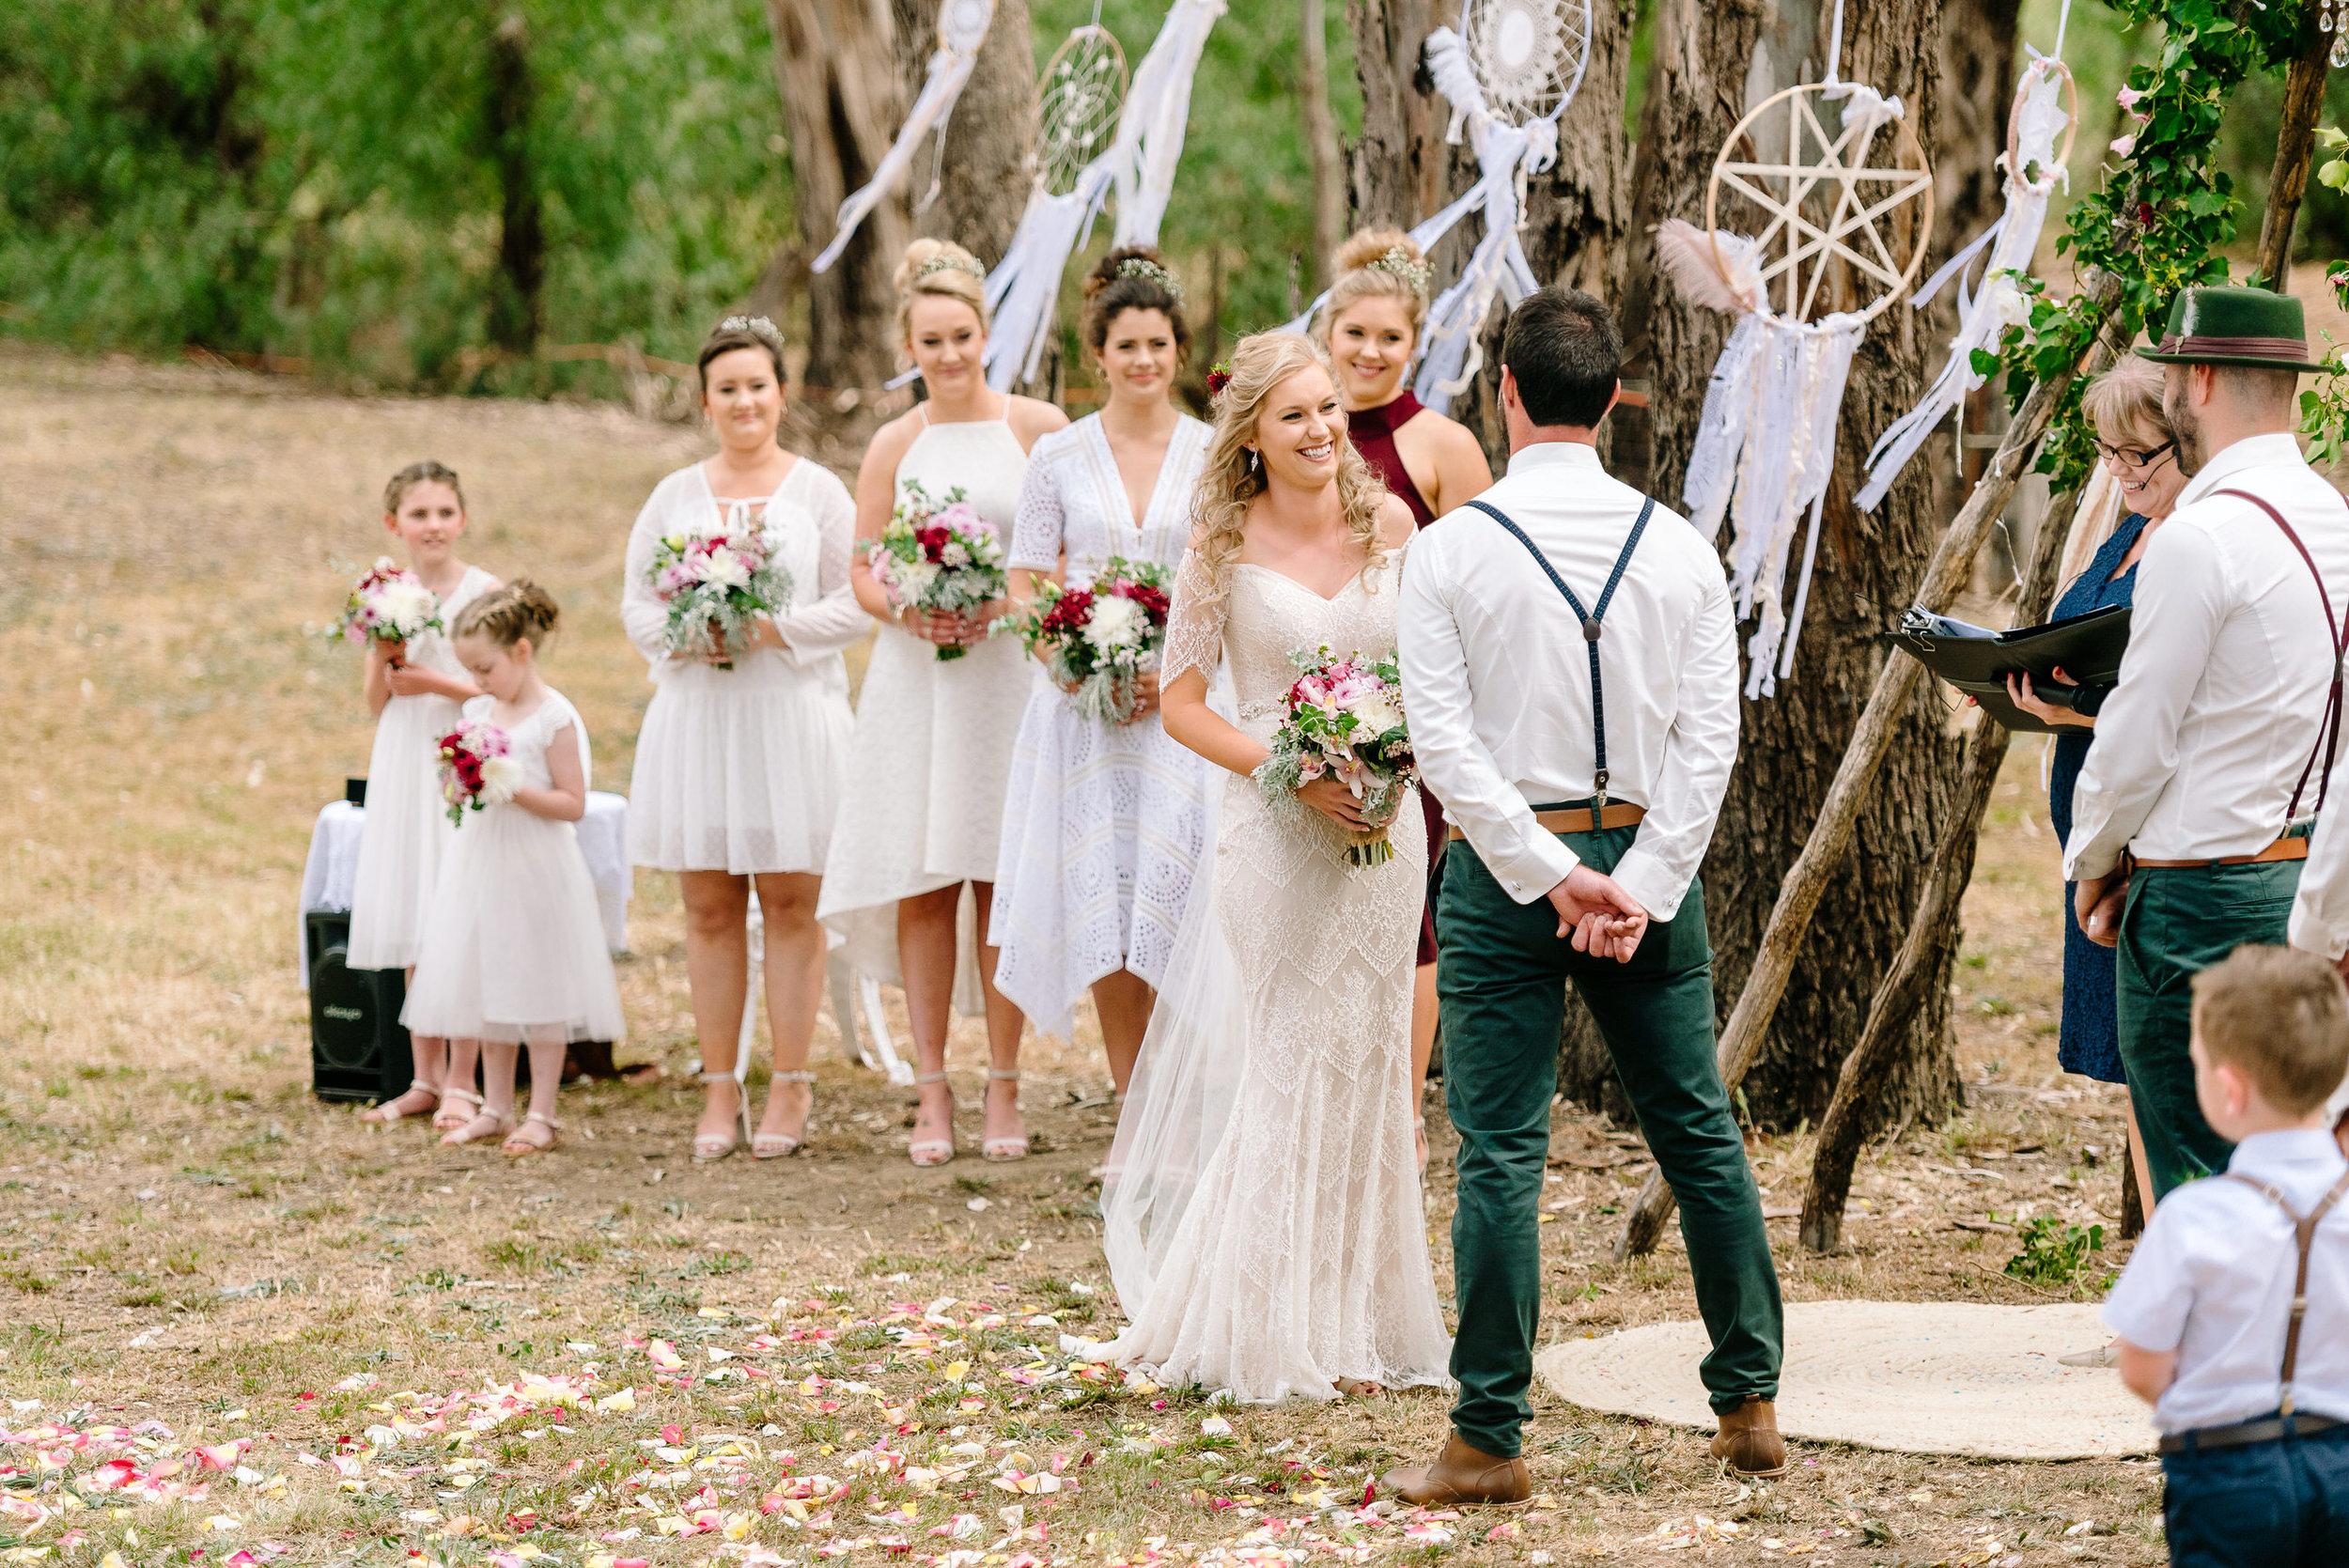 Justin_And_Jim_Photography_Backyard_Wedding173.JPG